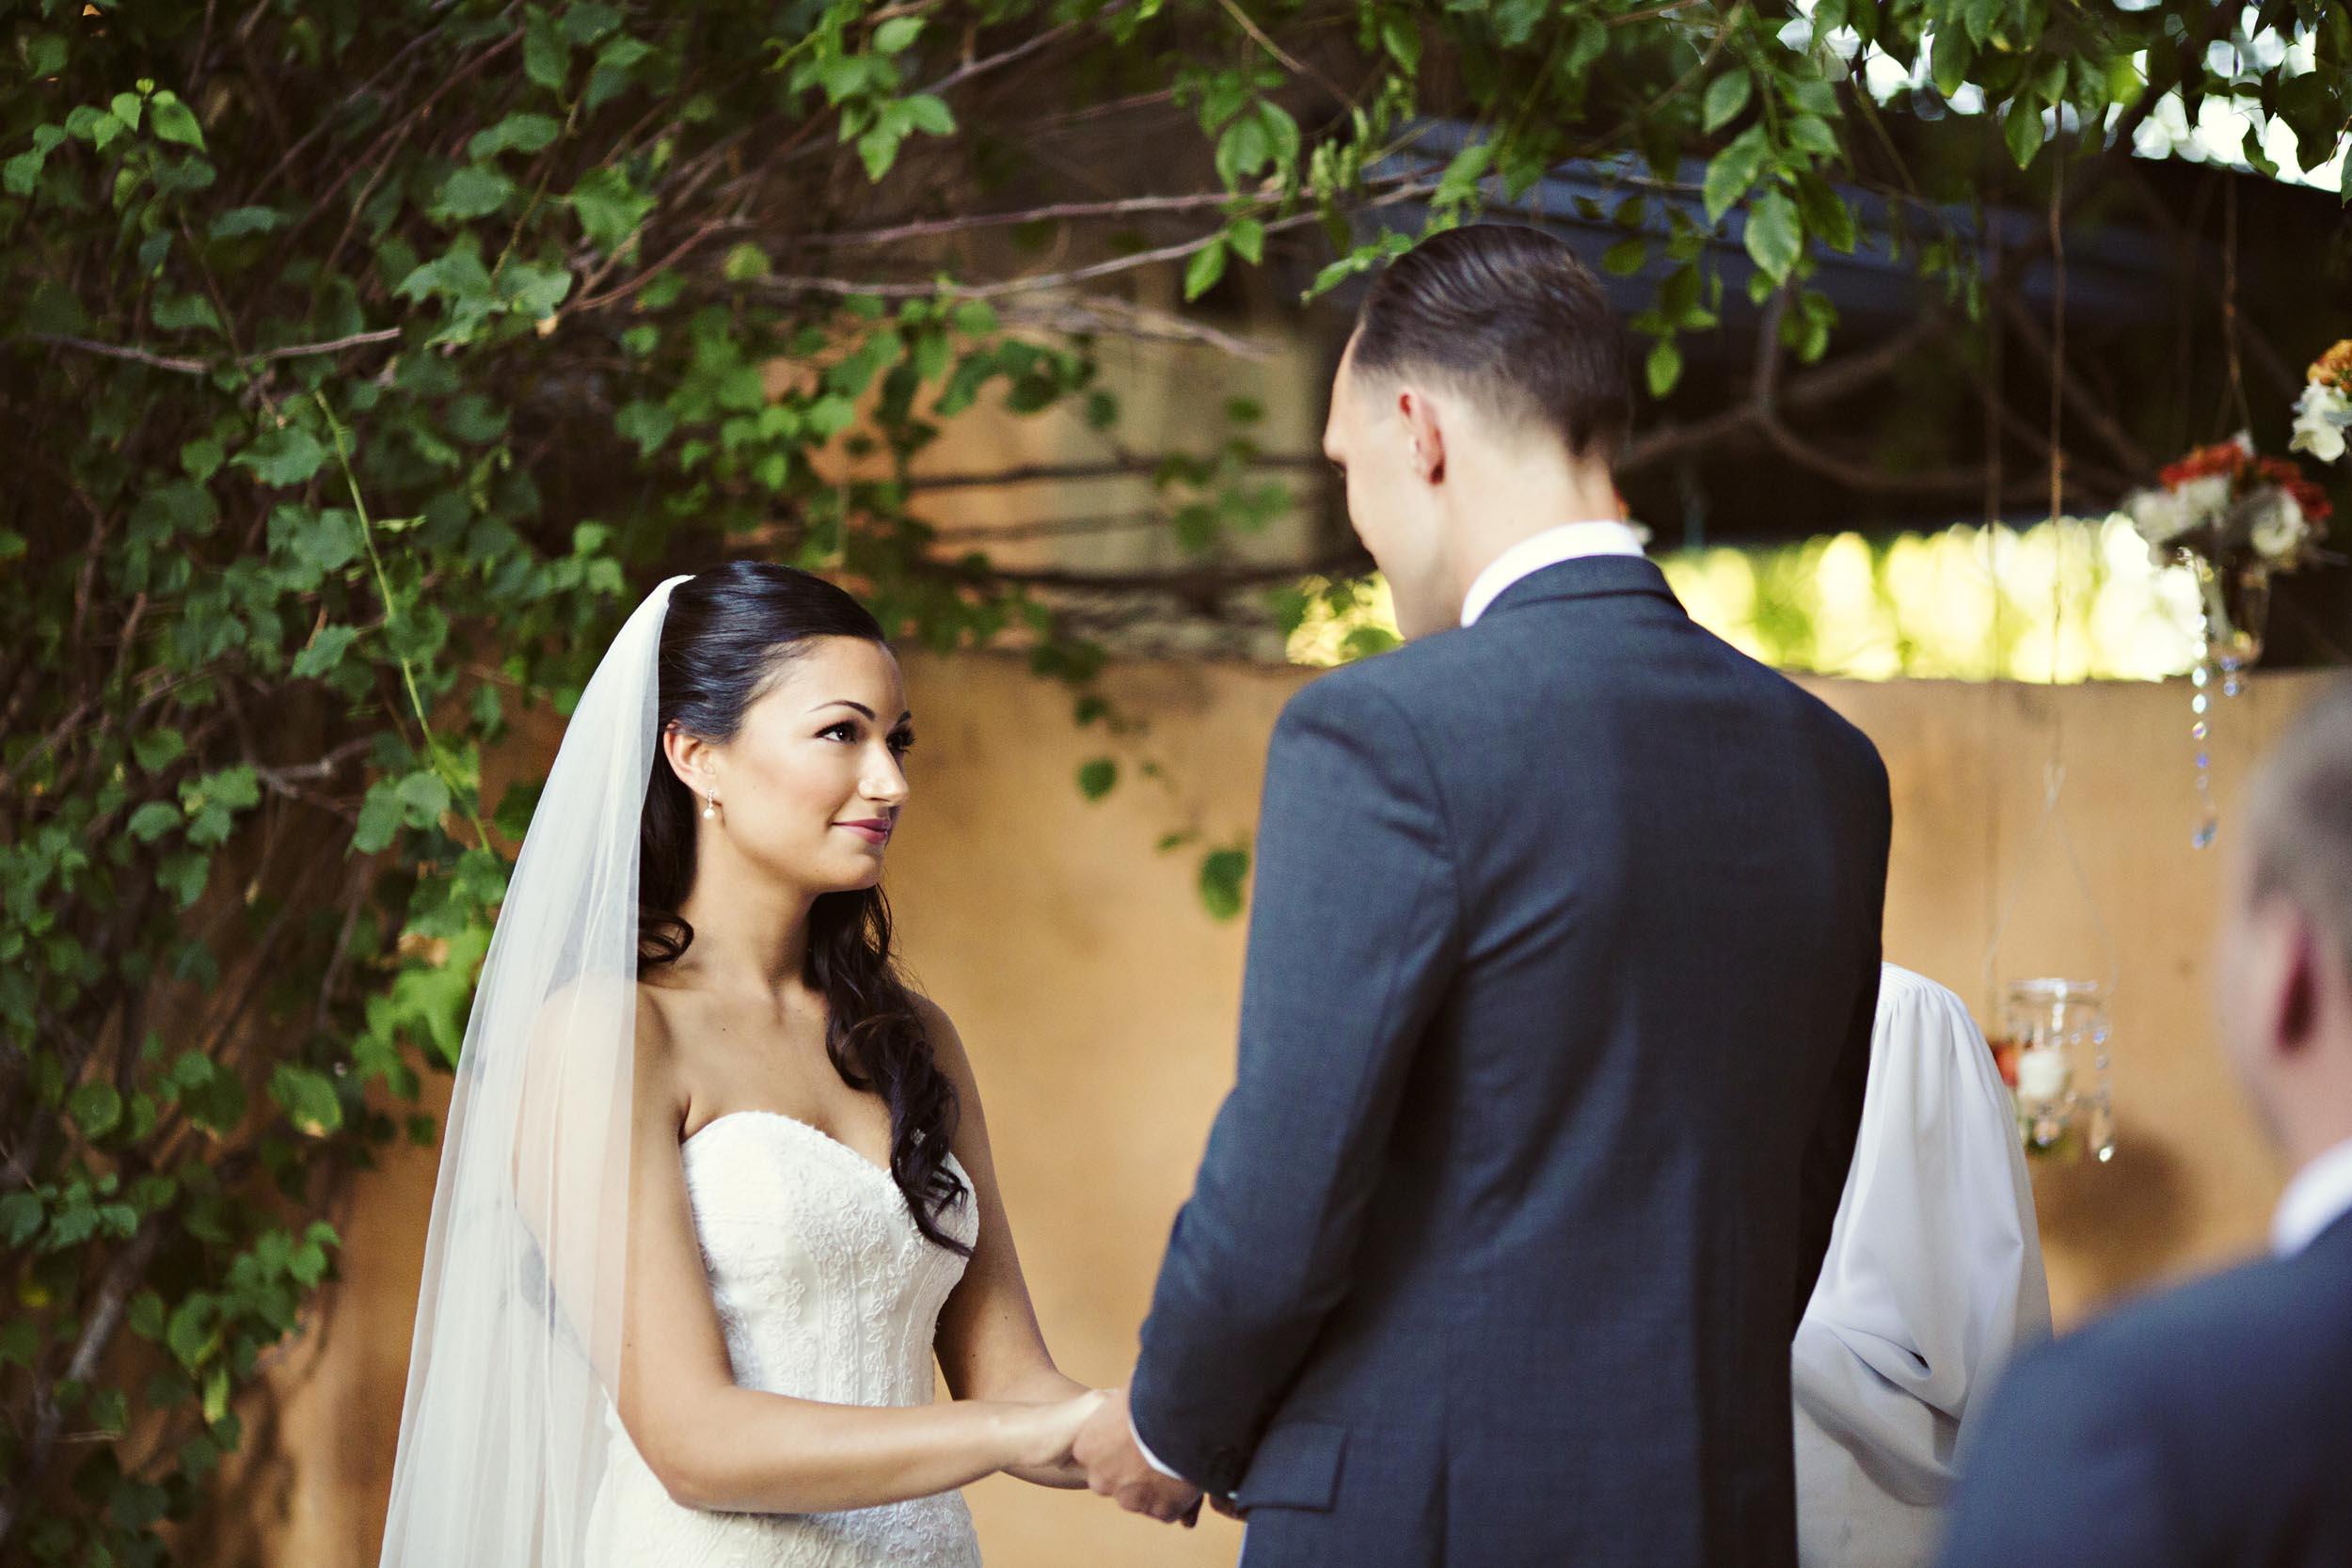 weddings-royalpalms-13.JPG